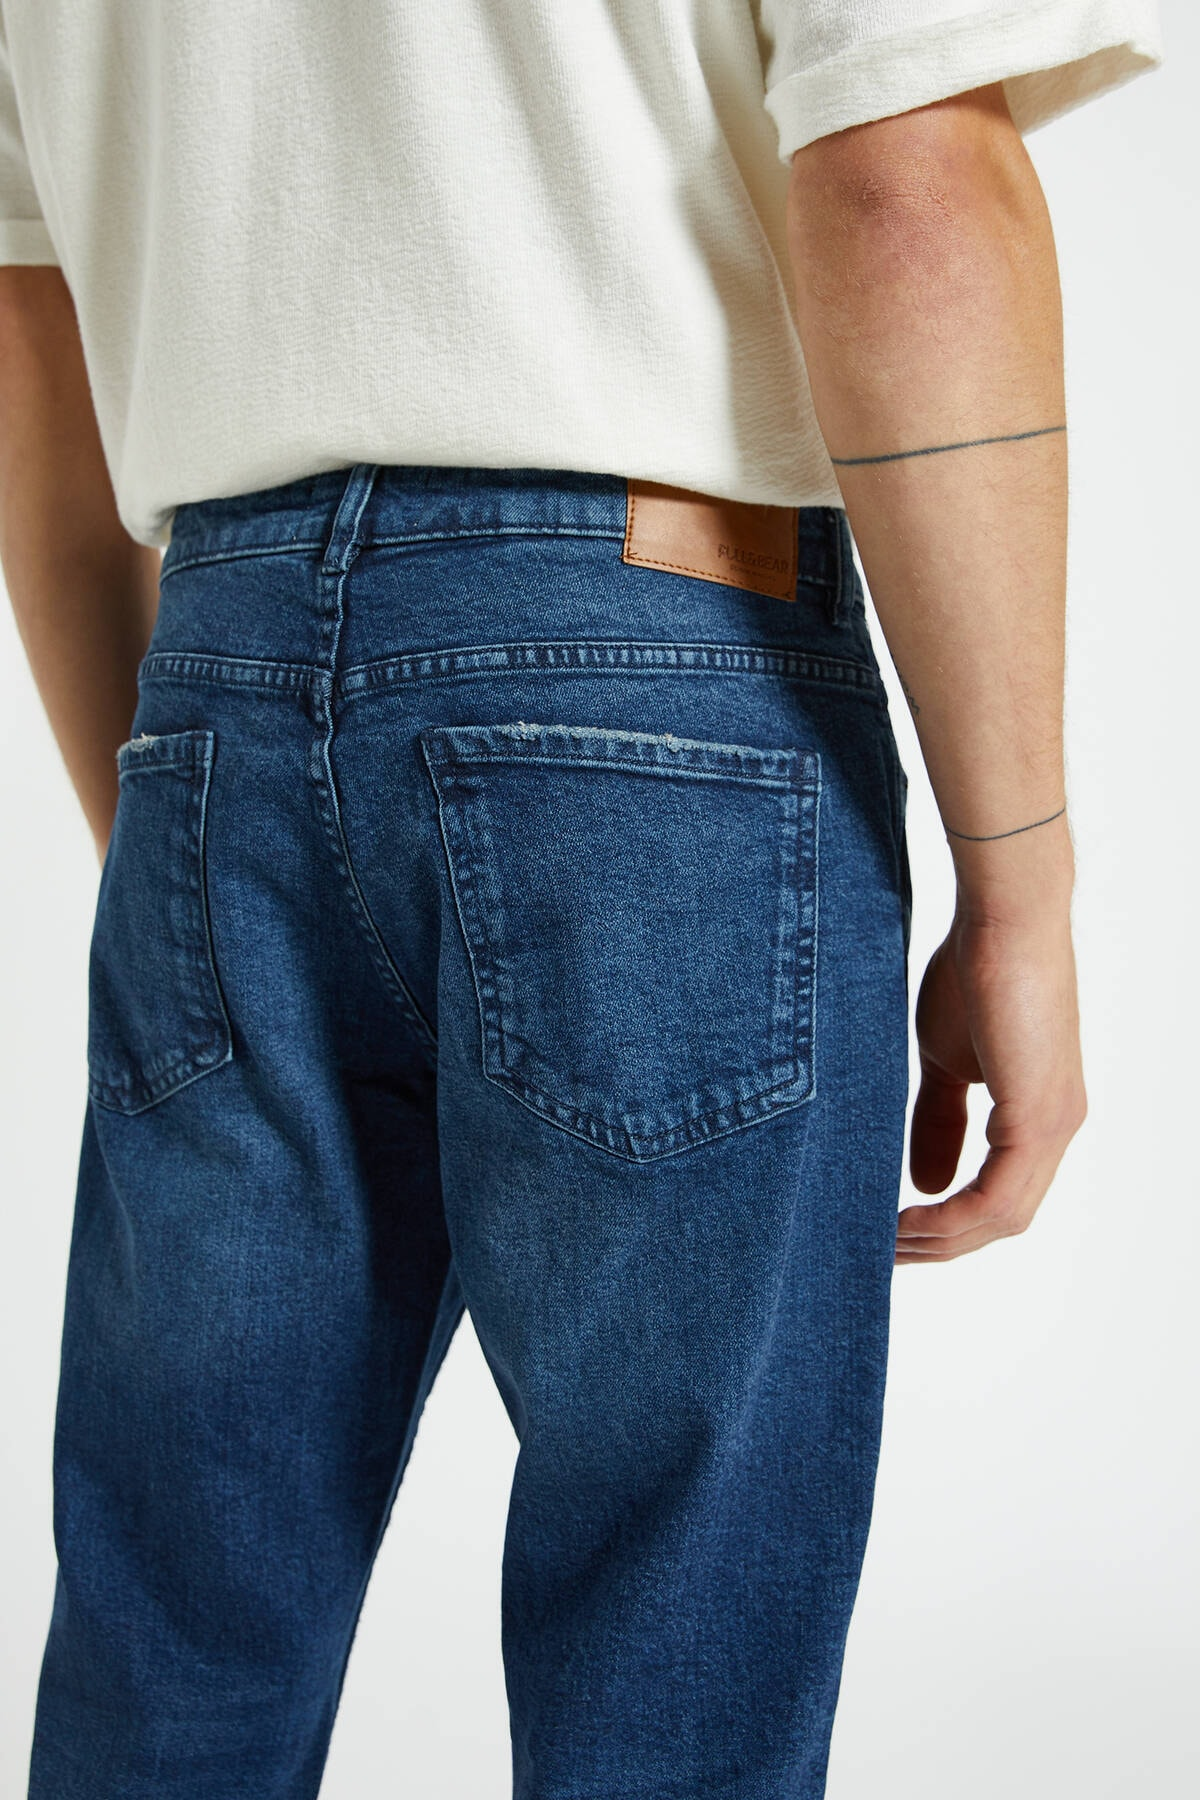 Pull & Bear Erkek Koyu Mavi Comfort Slim Fit Jean 09683530 1